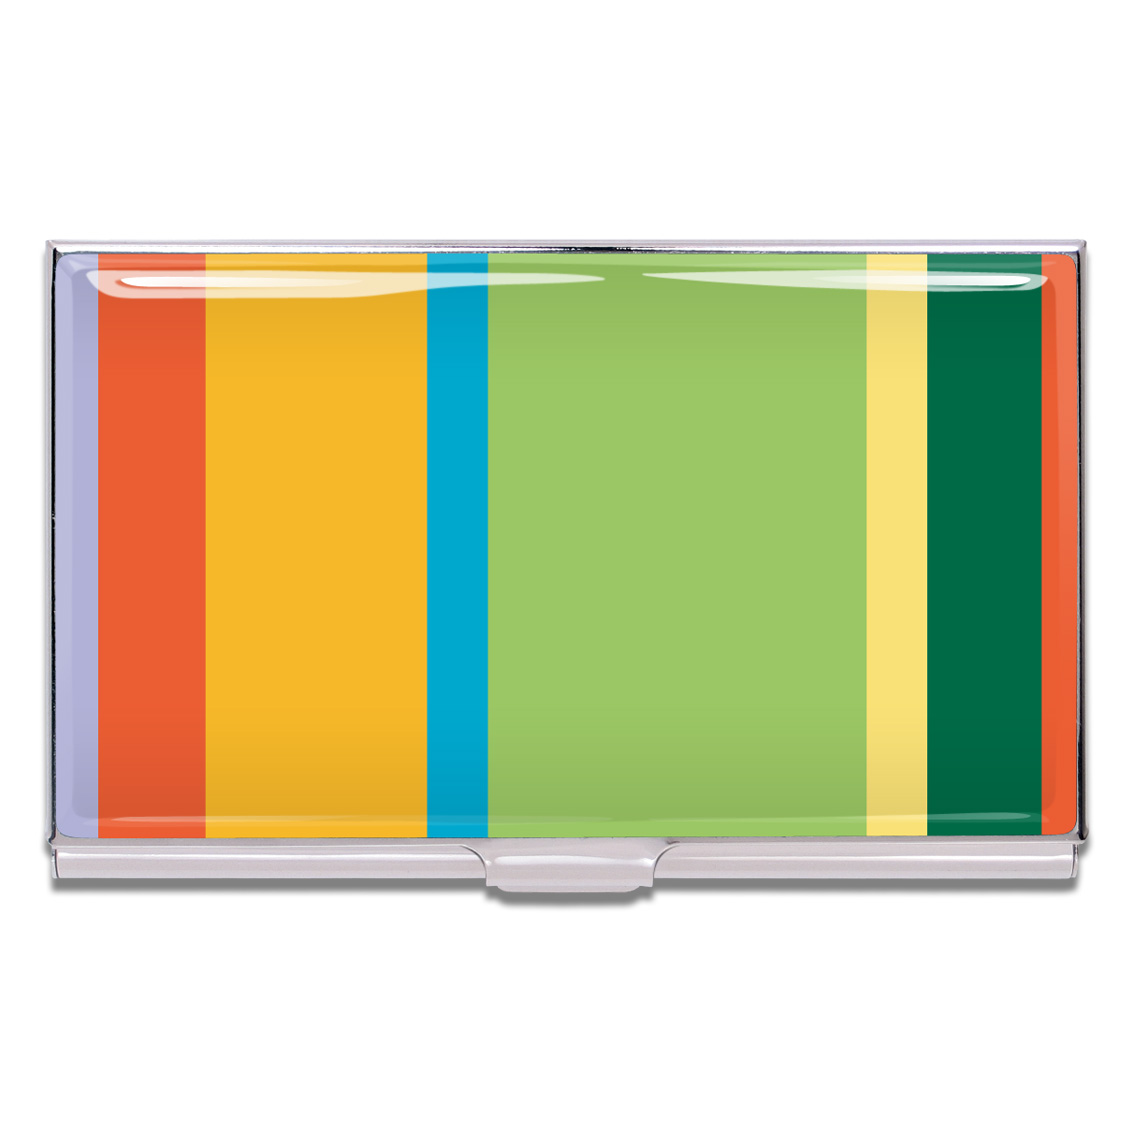 Shop gm vertical business card case by gene meyer cgm01bc on acme gm vertical business card case colourmoves